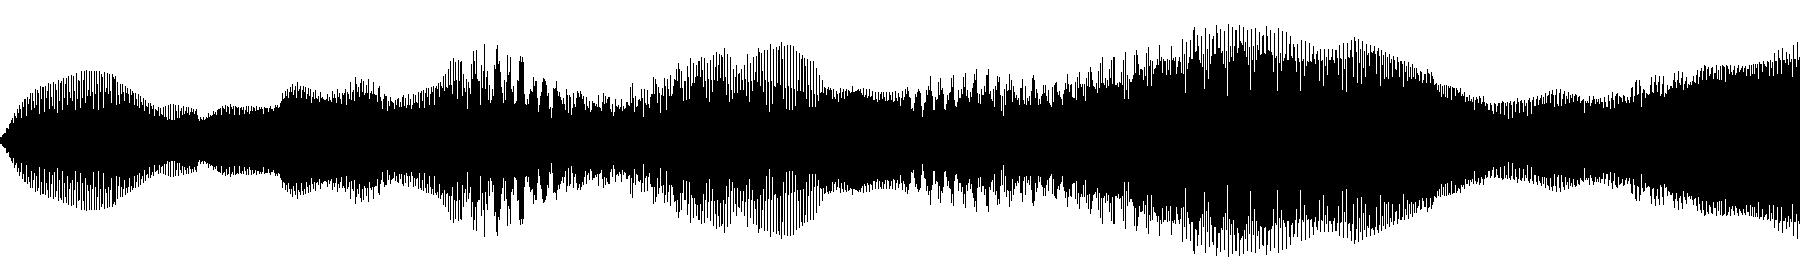 90 d 14